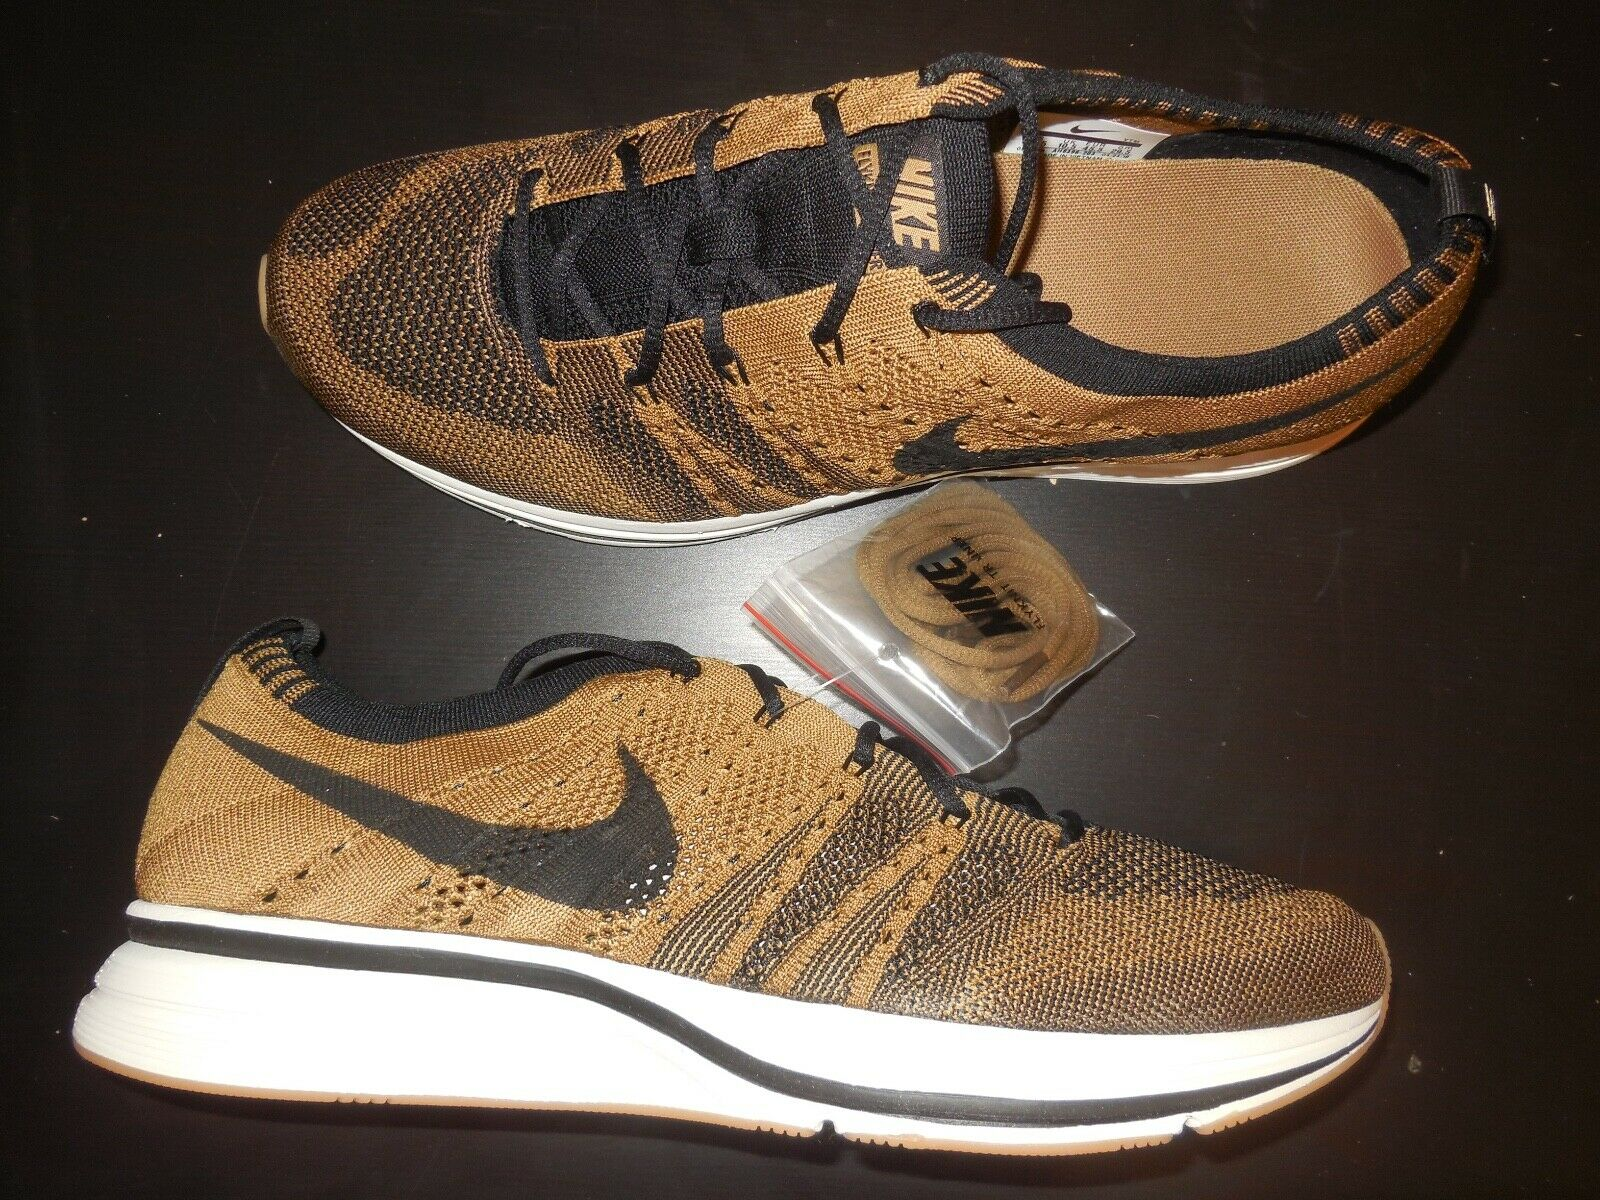 Men's Nike Flyknit Trainer shoes -StyleAH8396 203- Reg  150 -Sz 10.5 -NEW